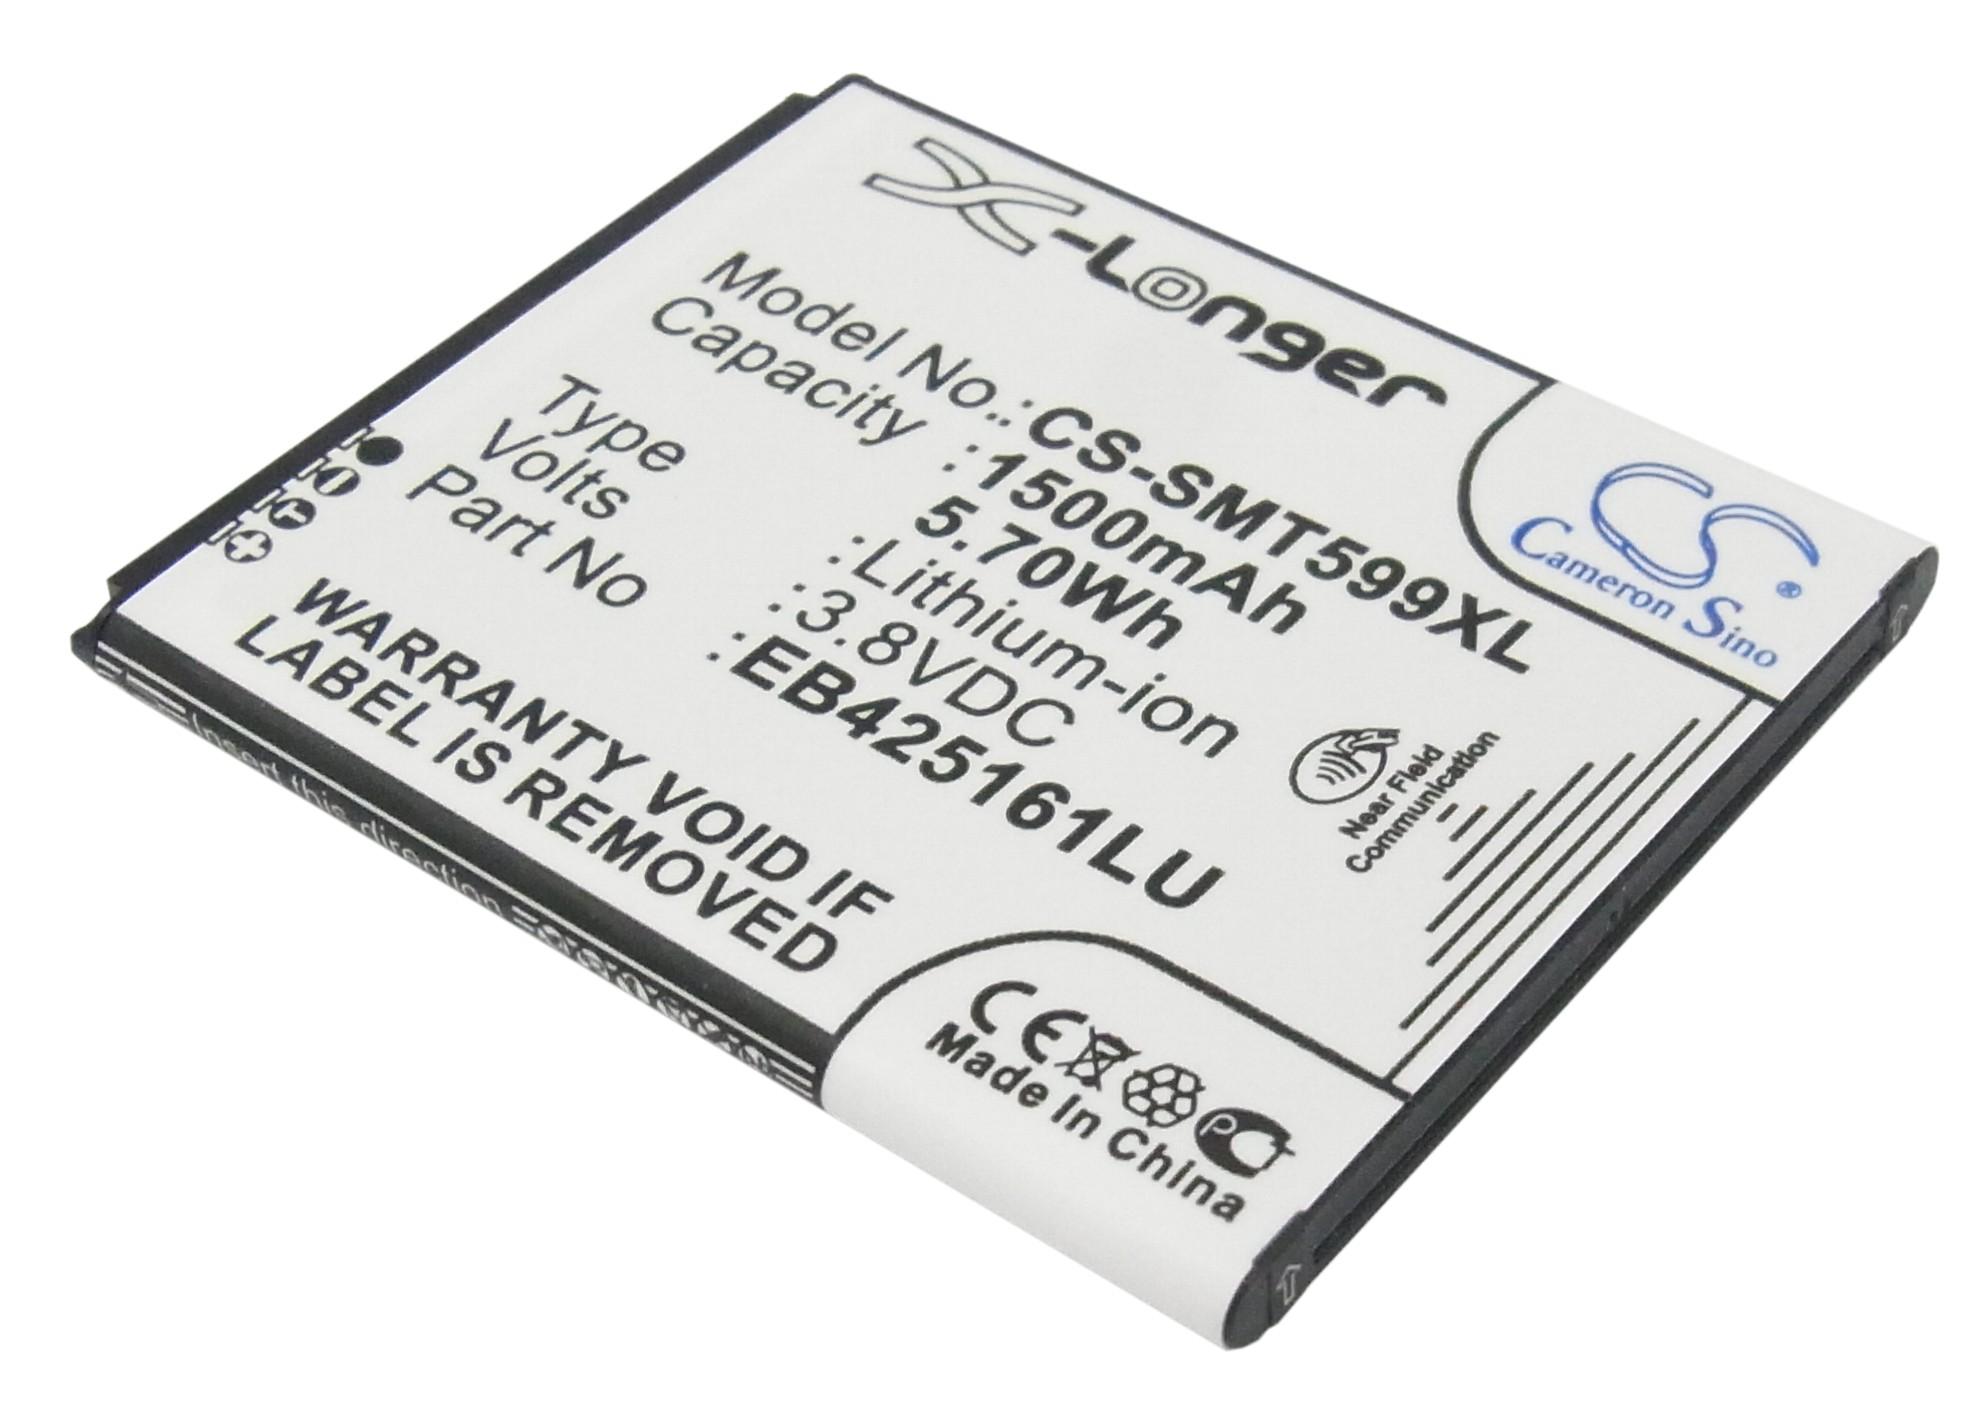 Cameron Sino baterie do mobilů pro SAMSUNG GT-S7582 3.8V Li-ion 1500mAh černá - neoriginální